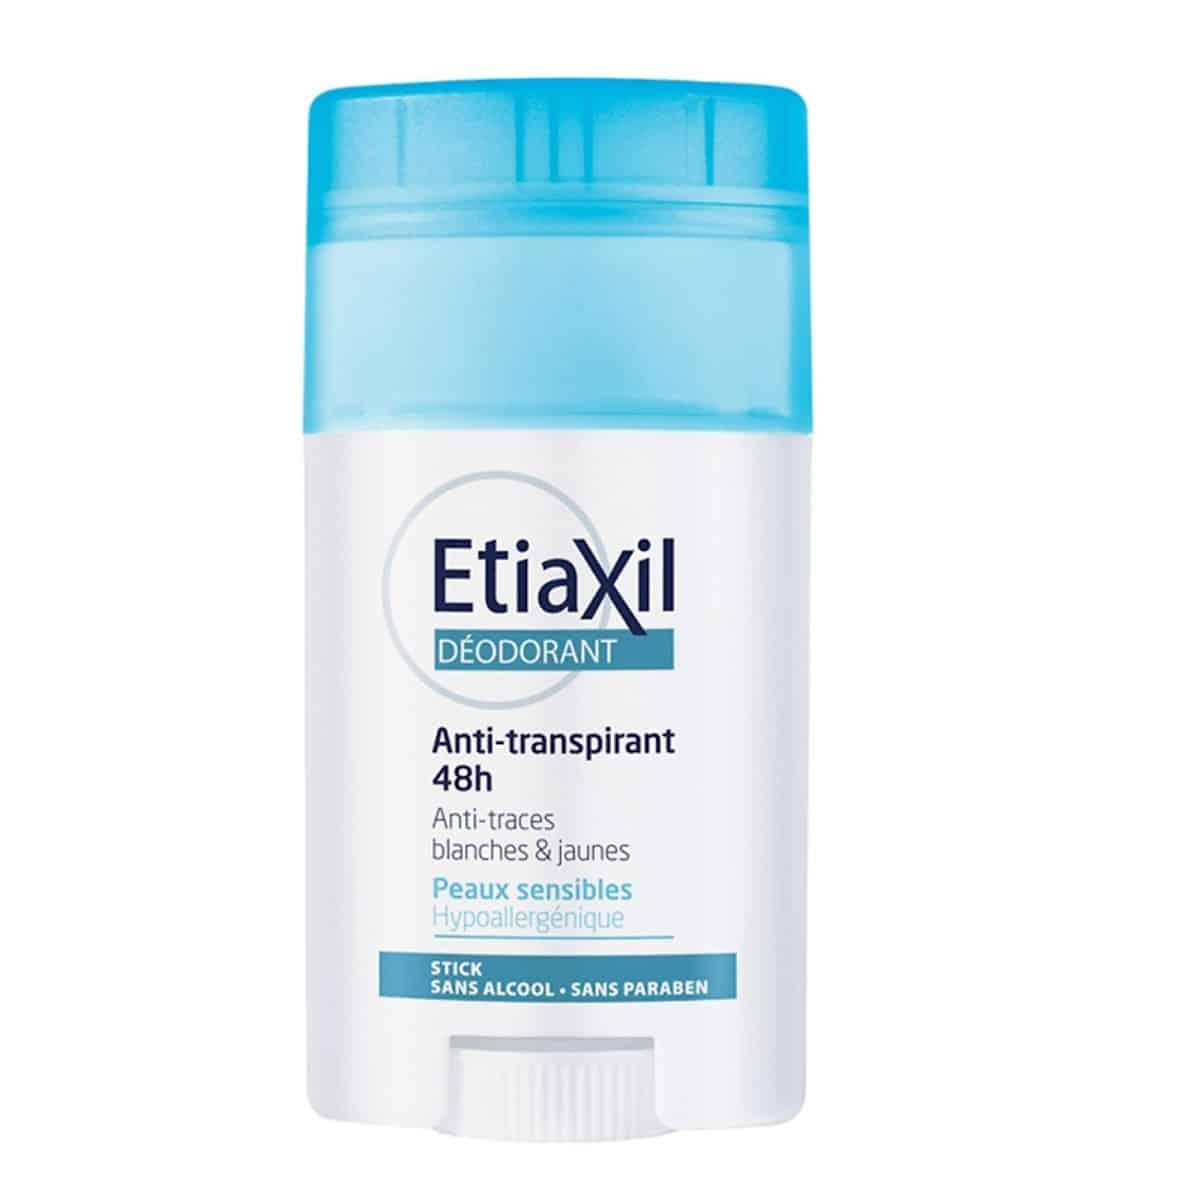 Sáp khử mùi Etiaxil Déodorant 48h 40ml